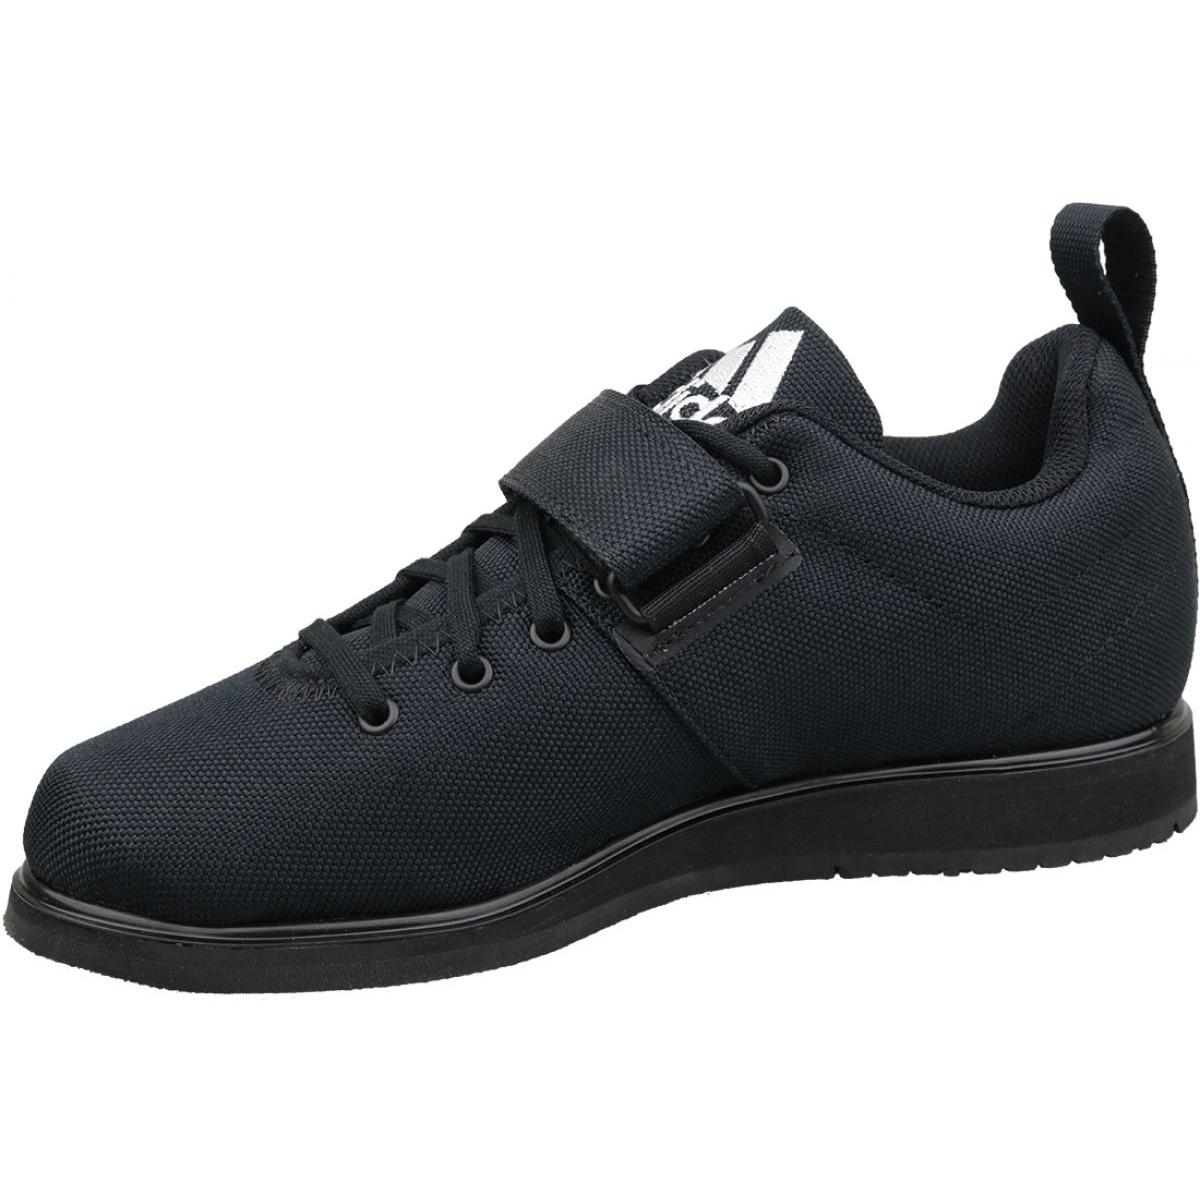 Adidas Powerlift 4 W BC0343 cipő fekete